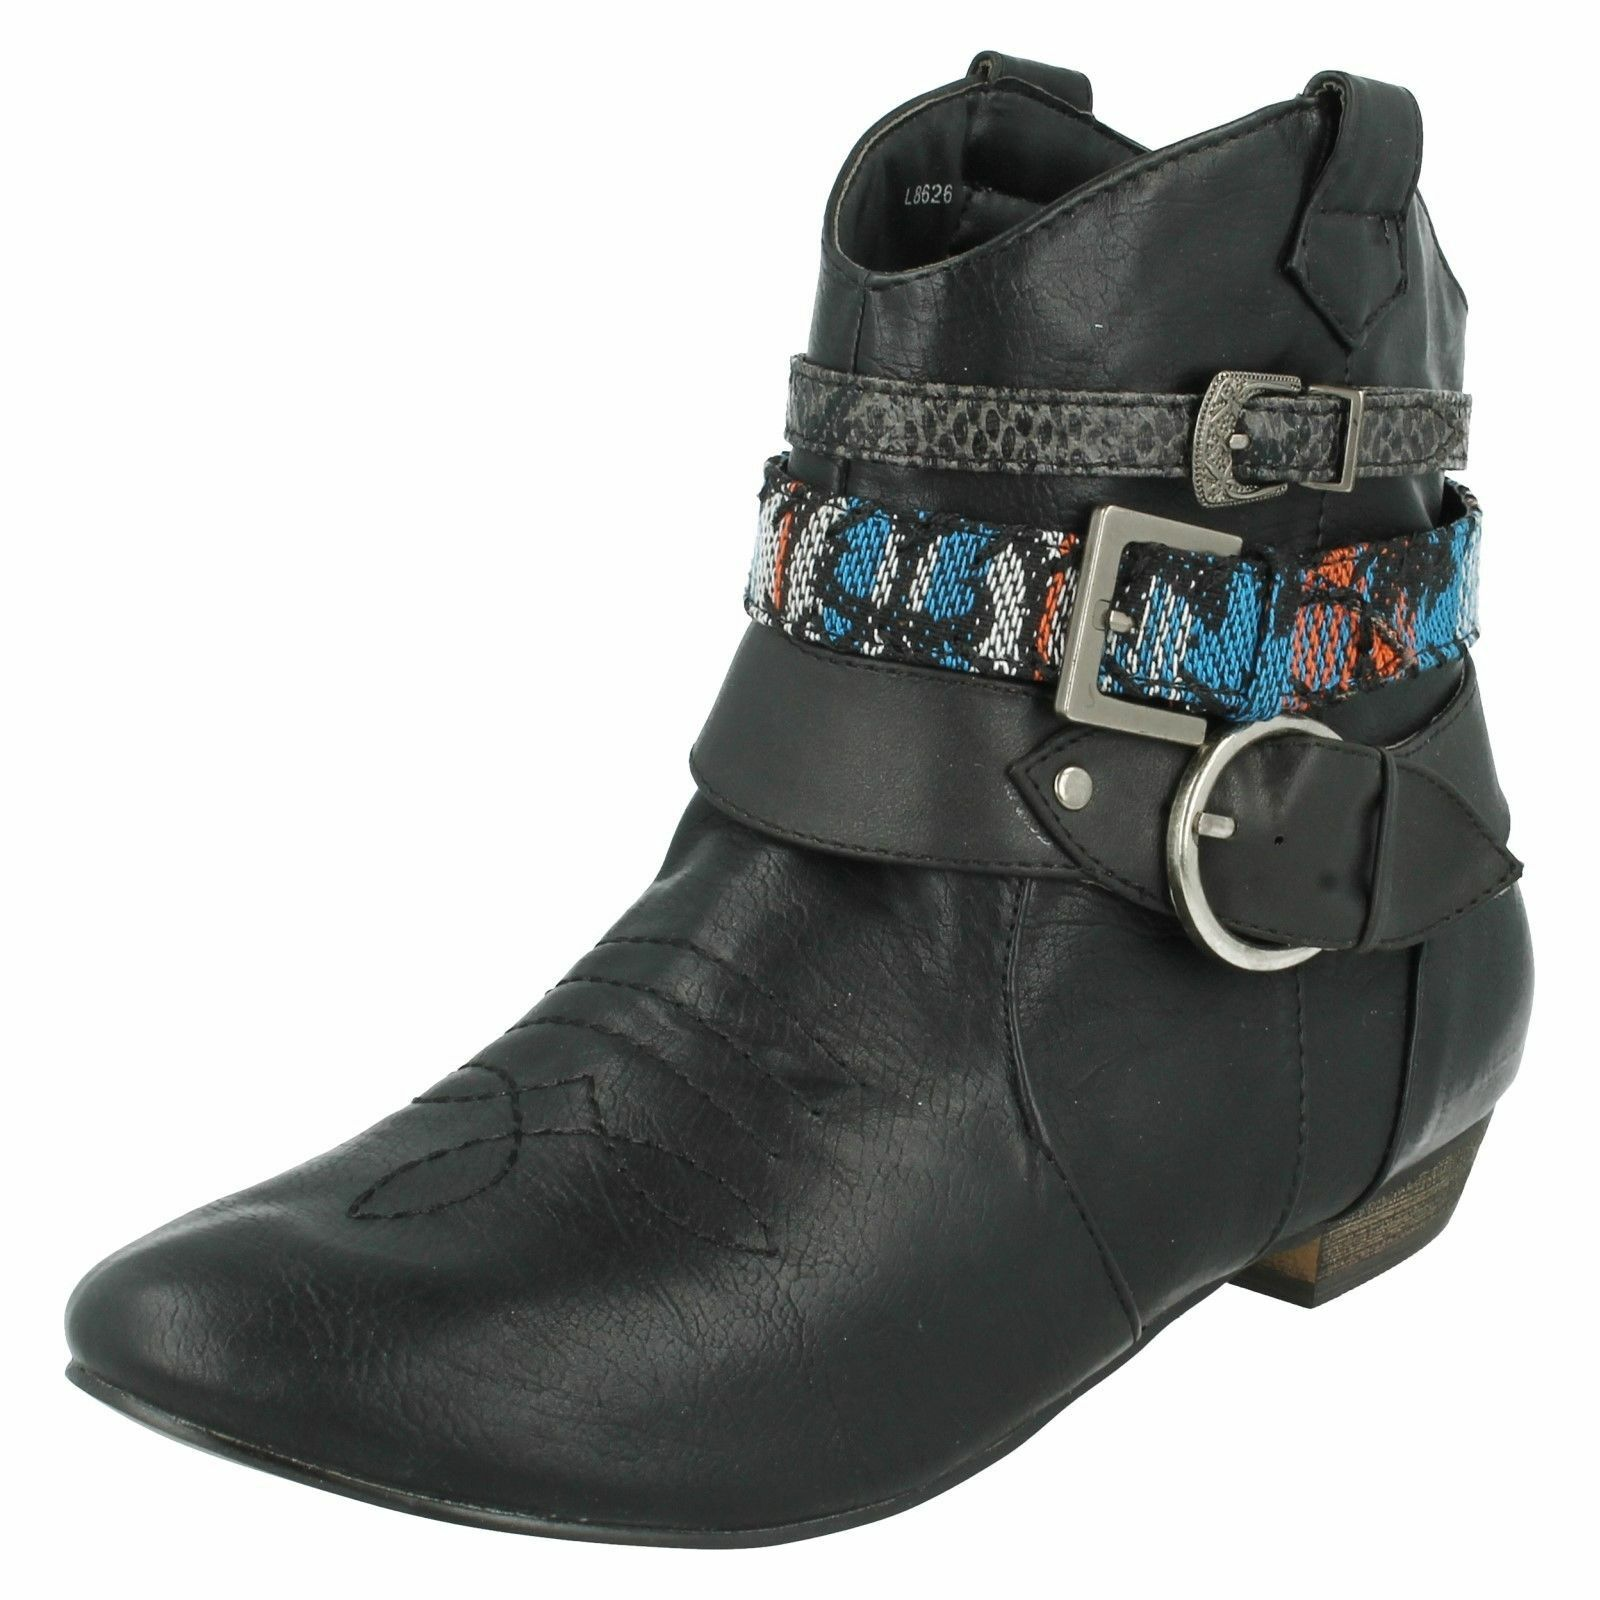 Spot On L8626 Ladies Black Cowboy Pull-On Ankle Boots w/Ankle Straps(R36B)(K<wbr/>ett)